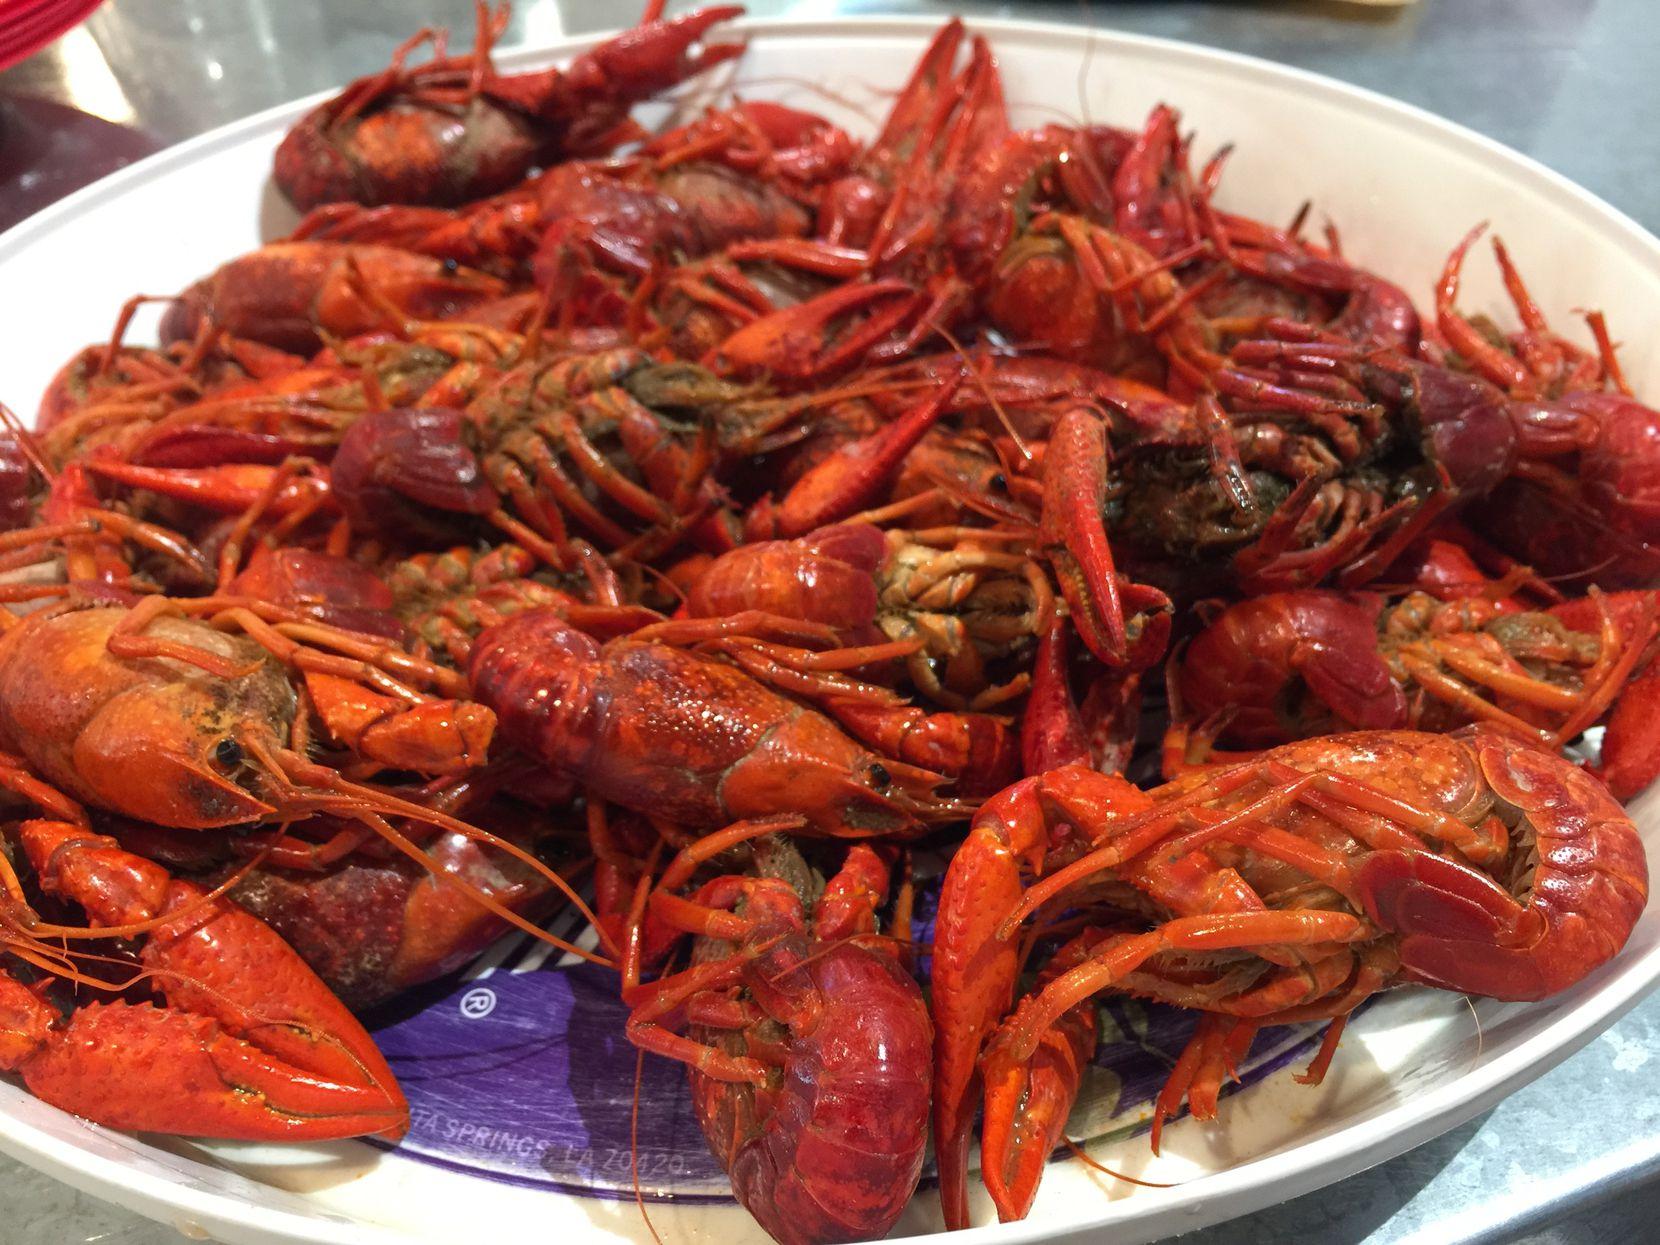 A 2-pound platter of boiled crawfish at Cajun Tailgators